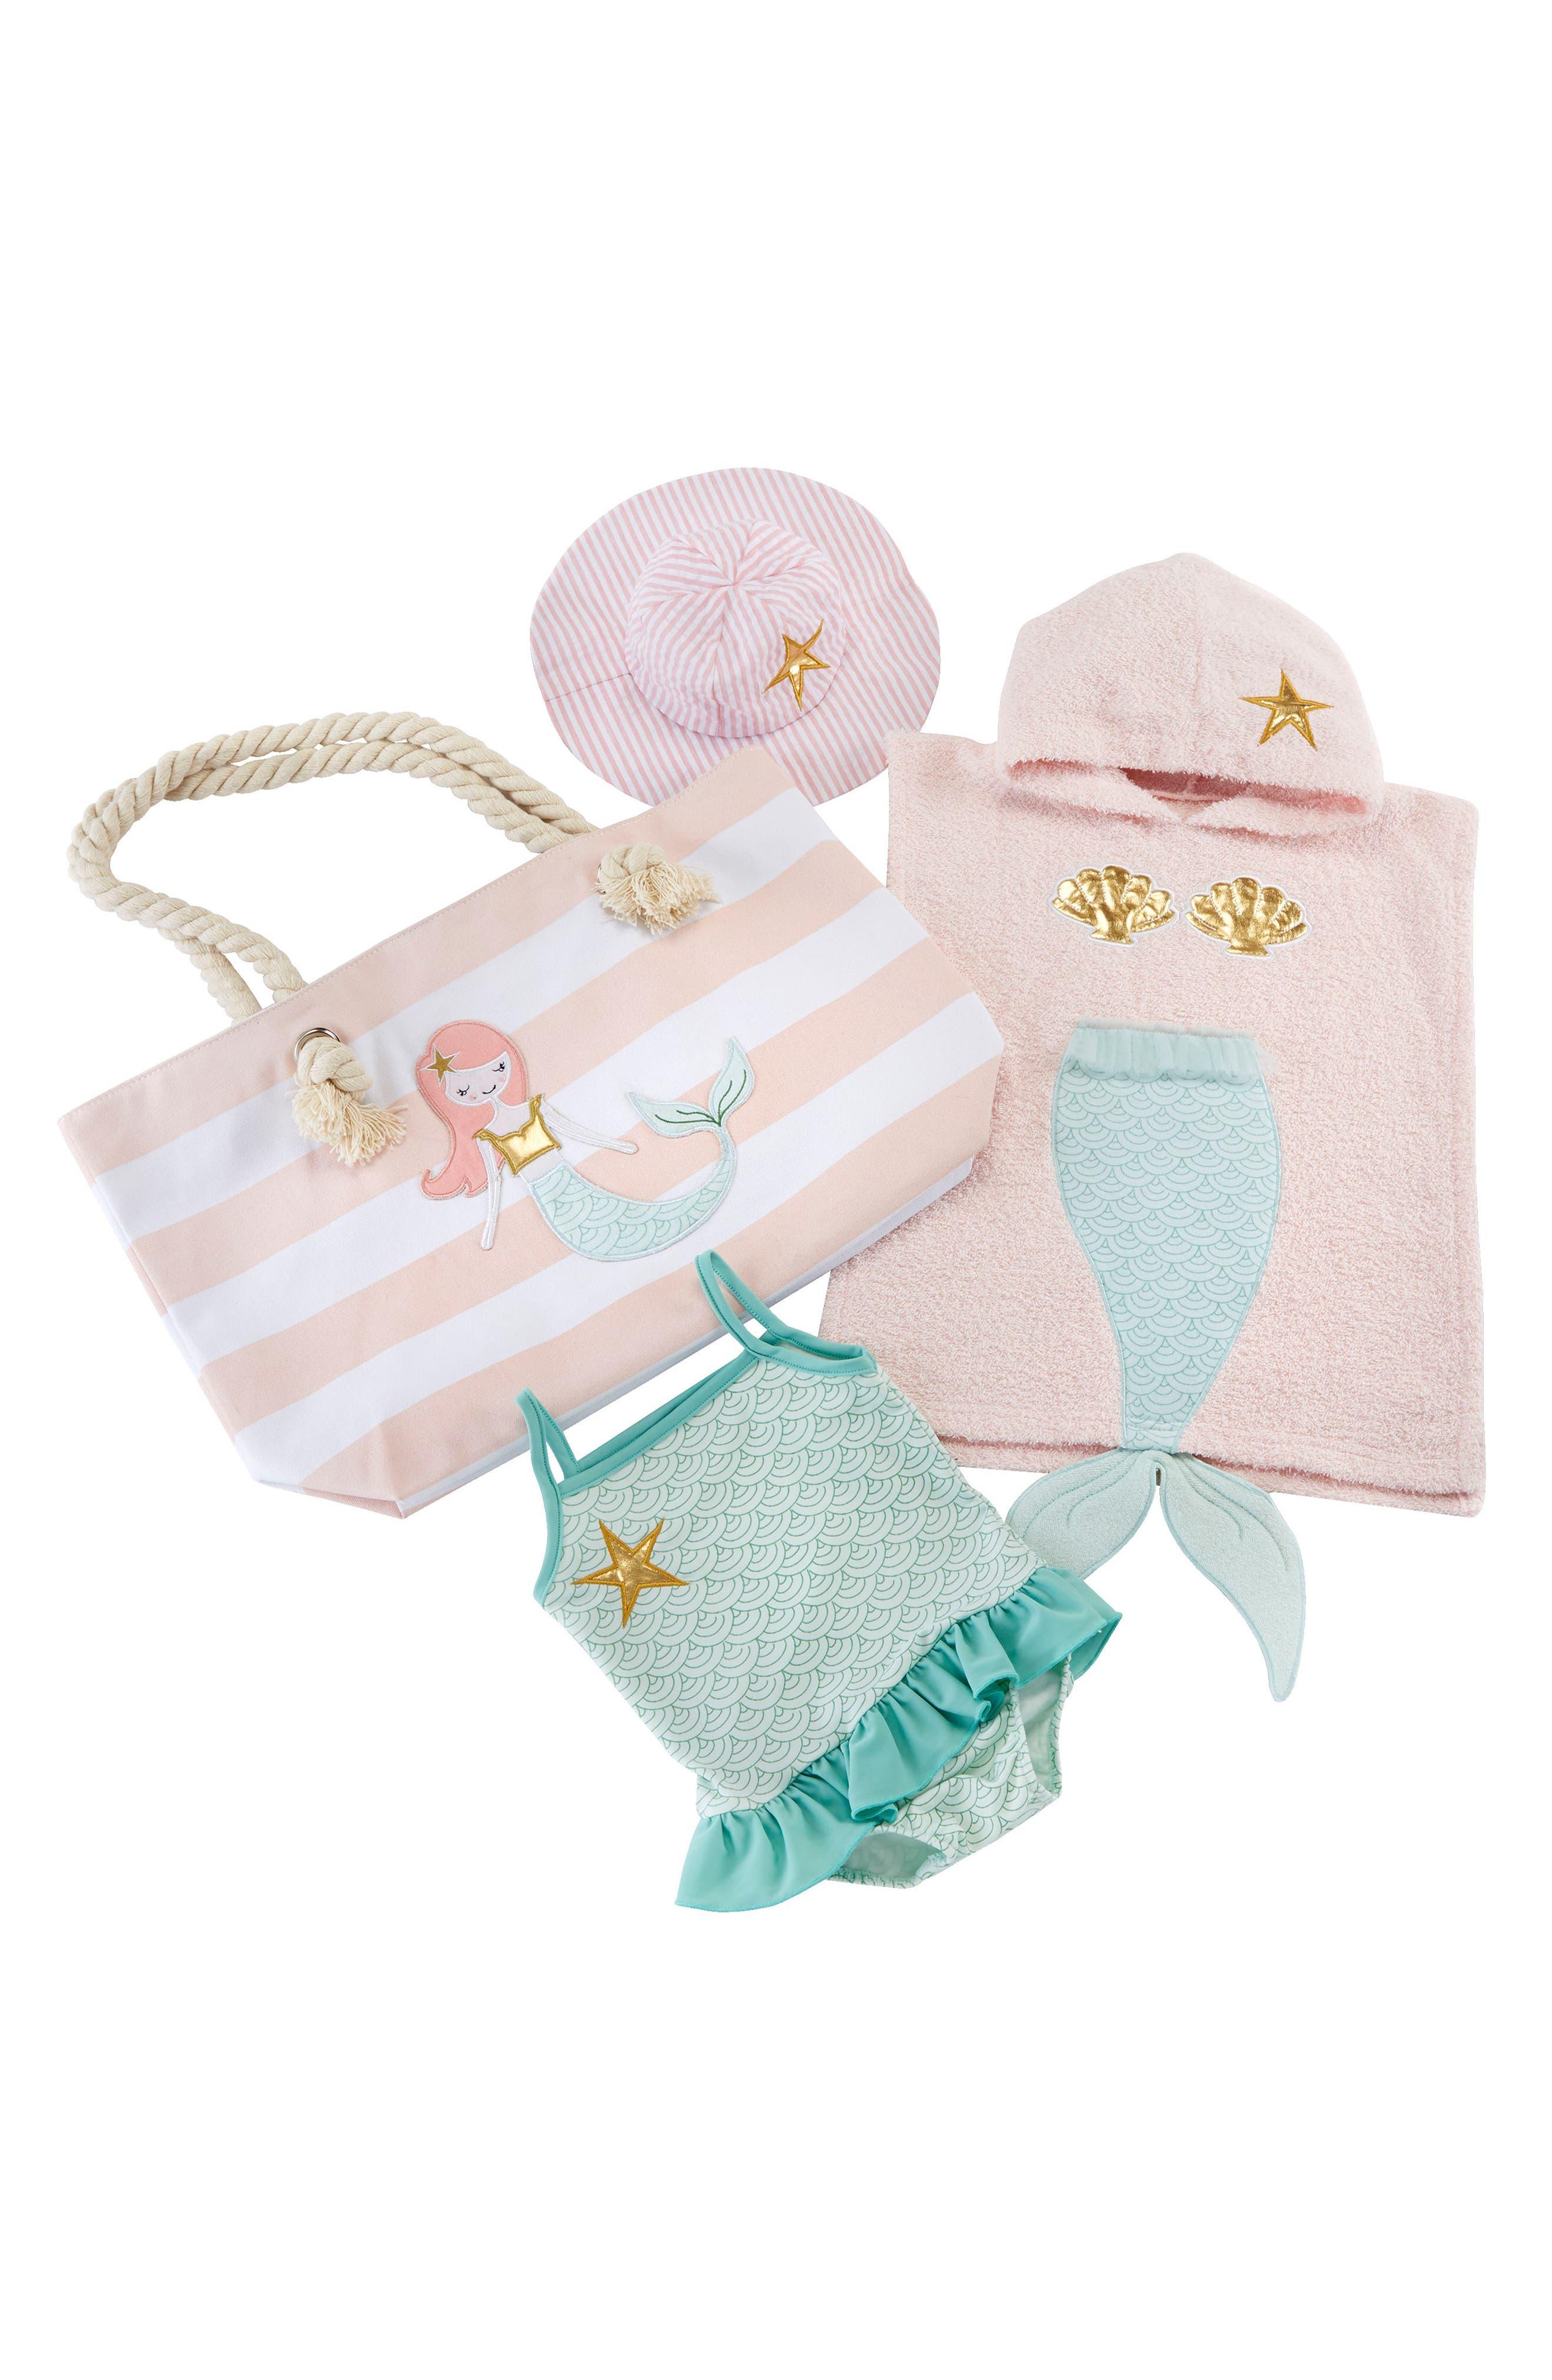 Mermaid Hooded Towel, Swimsuit, Sun Hat & Tote Set,                             Main thumbnail 1, color,                             PINK